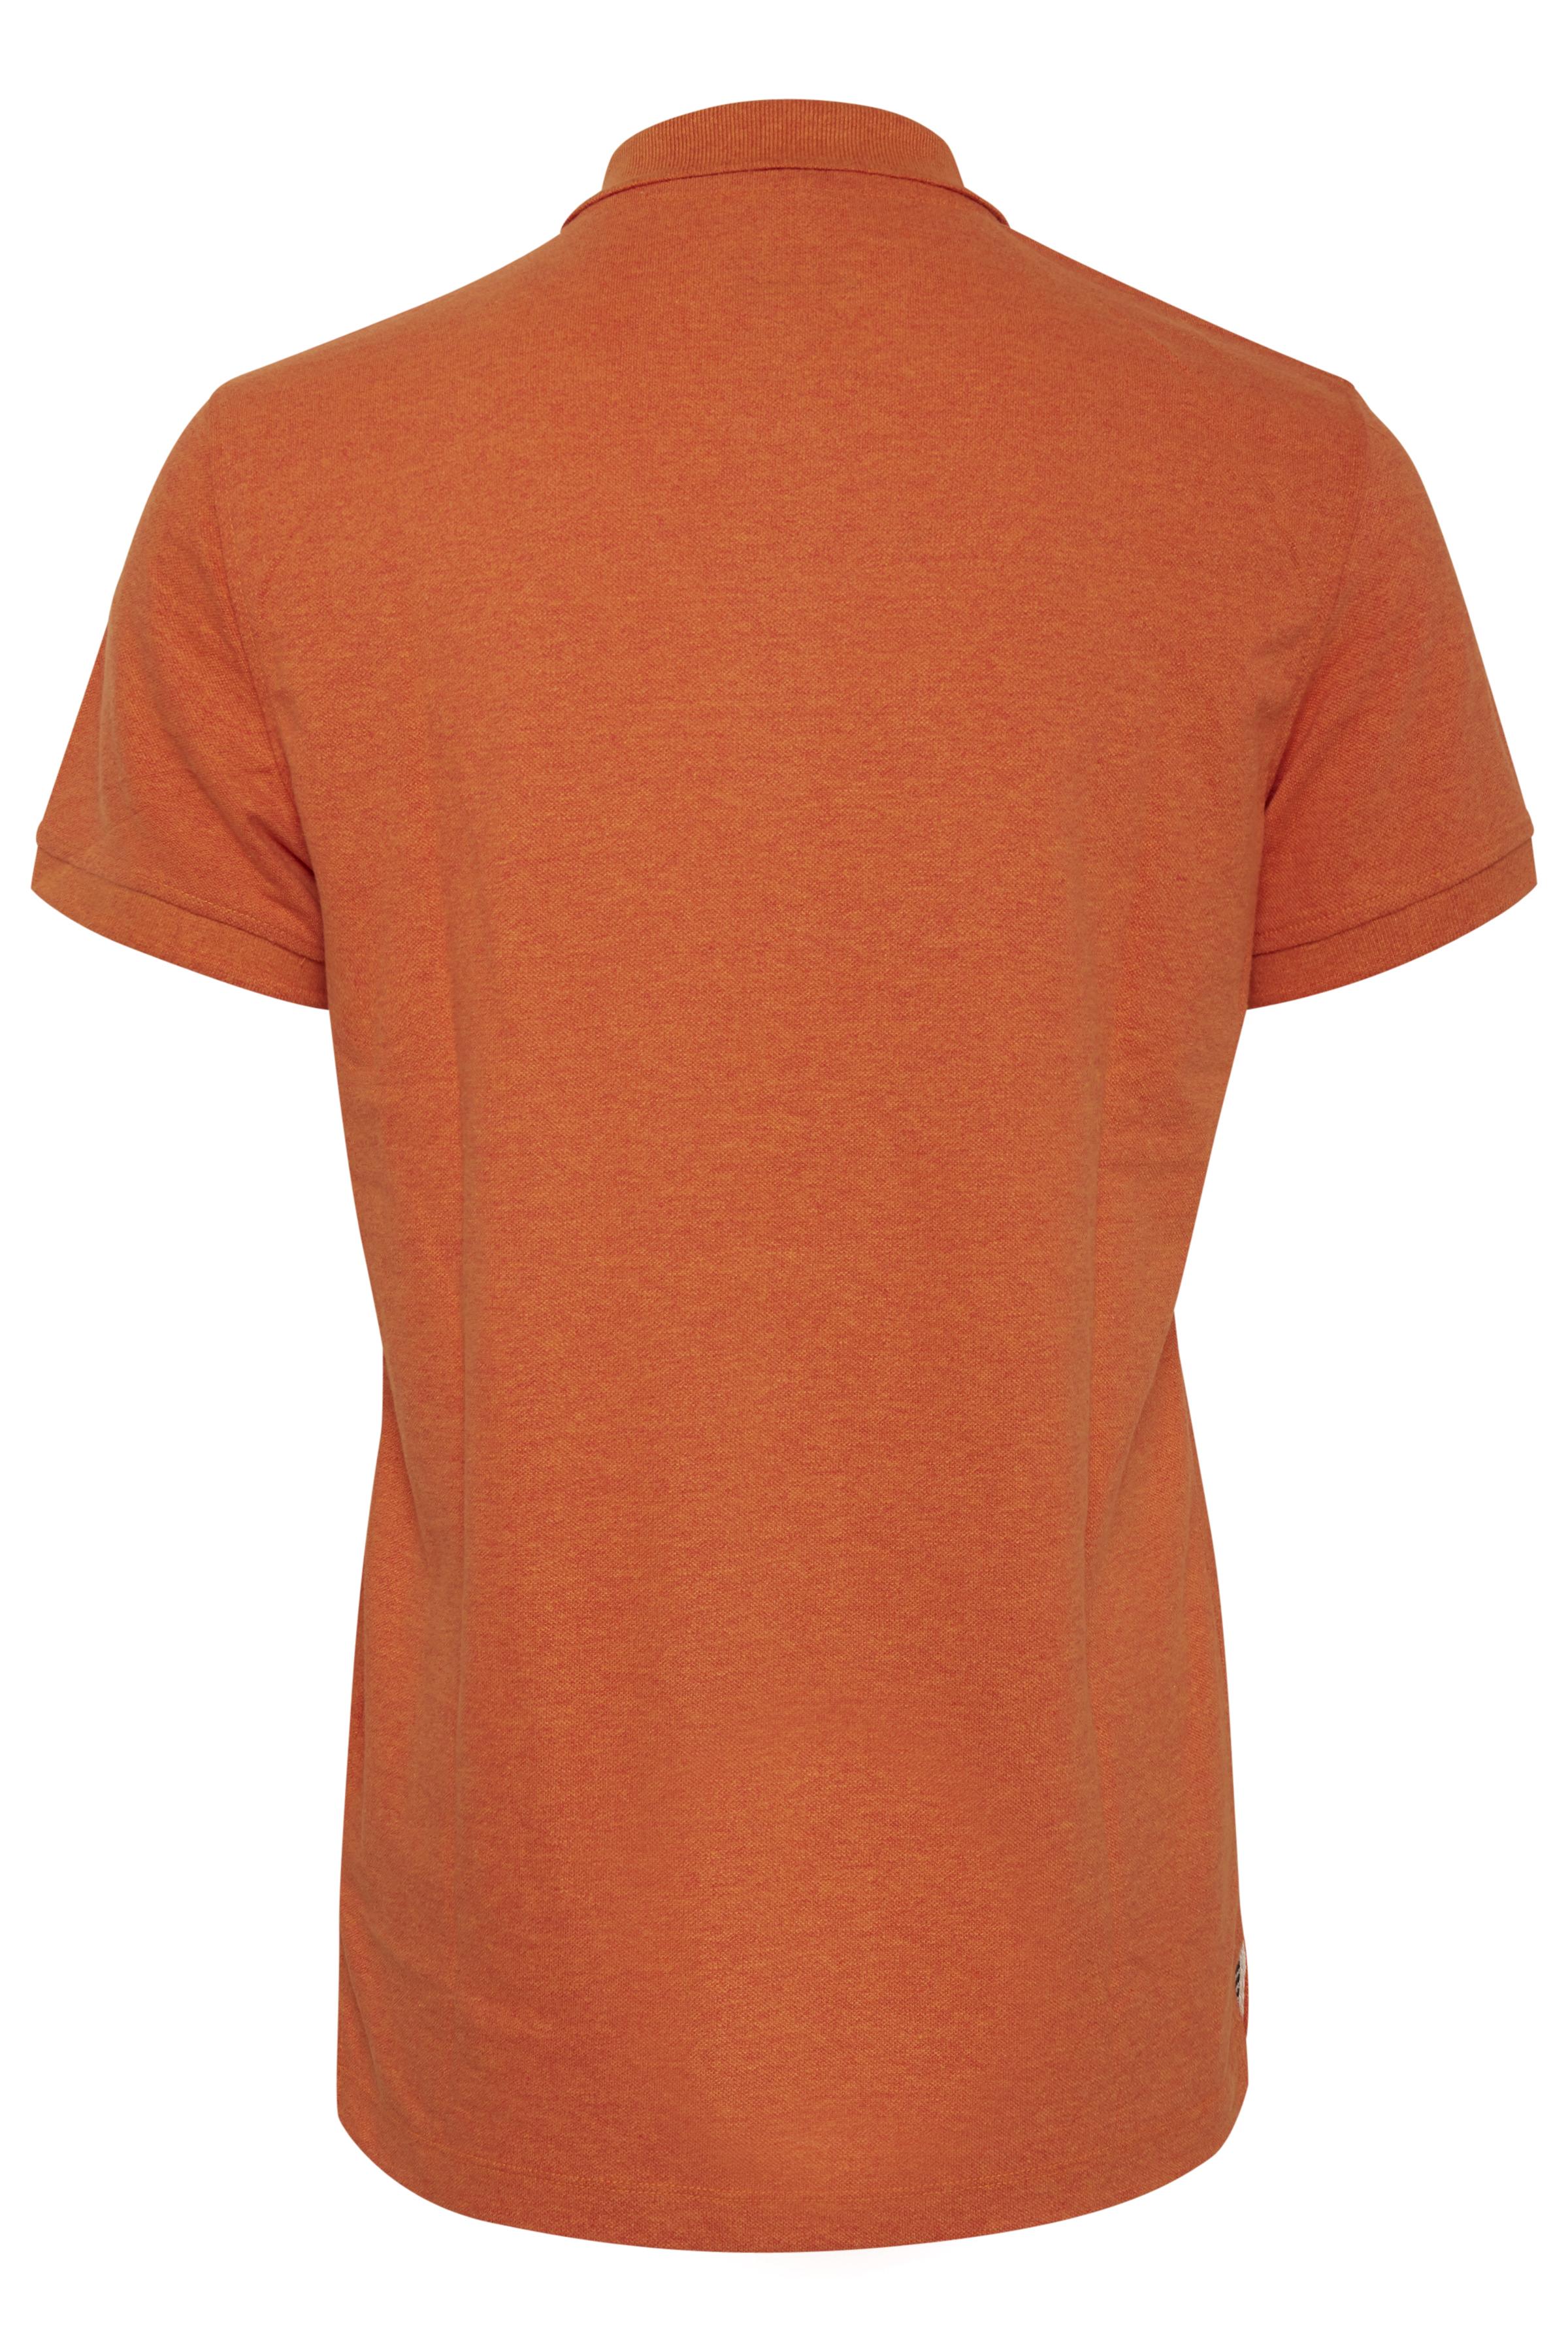 Sun Orange T-shirt – Køb Sun Orange T-shirt fra str. S-XXL her